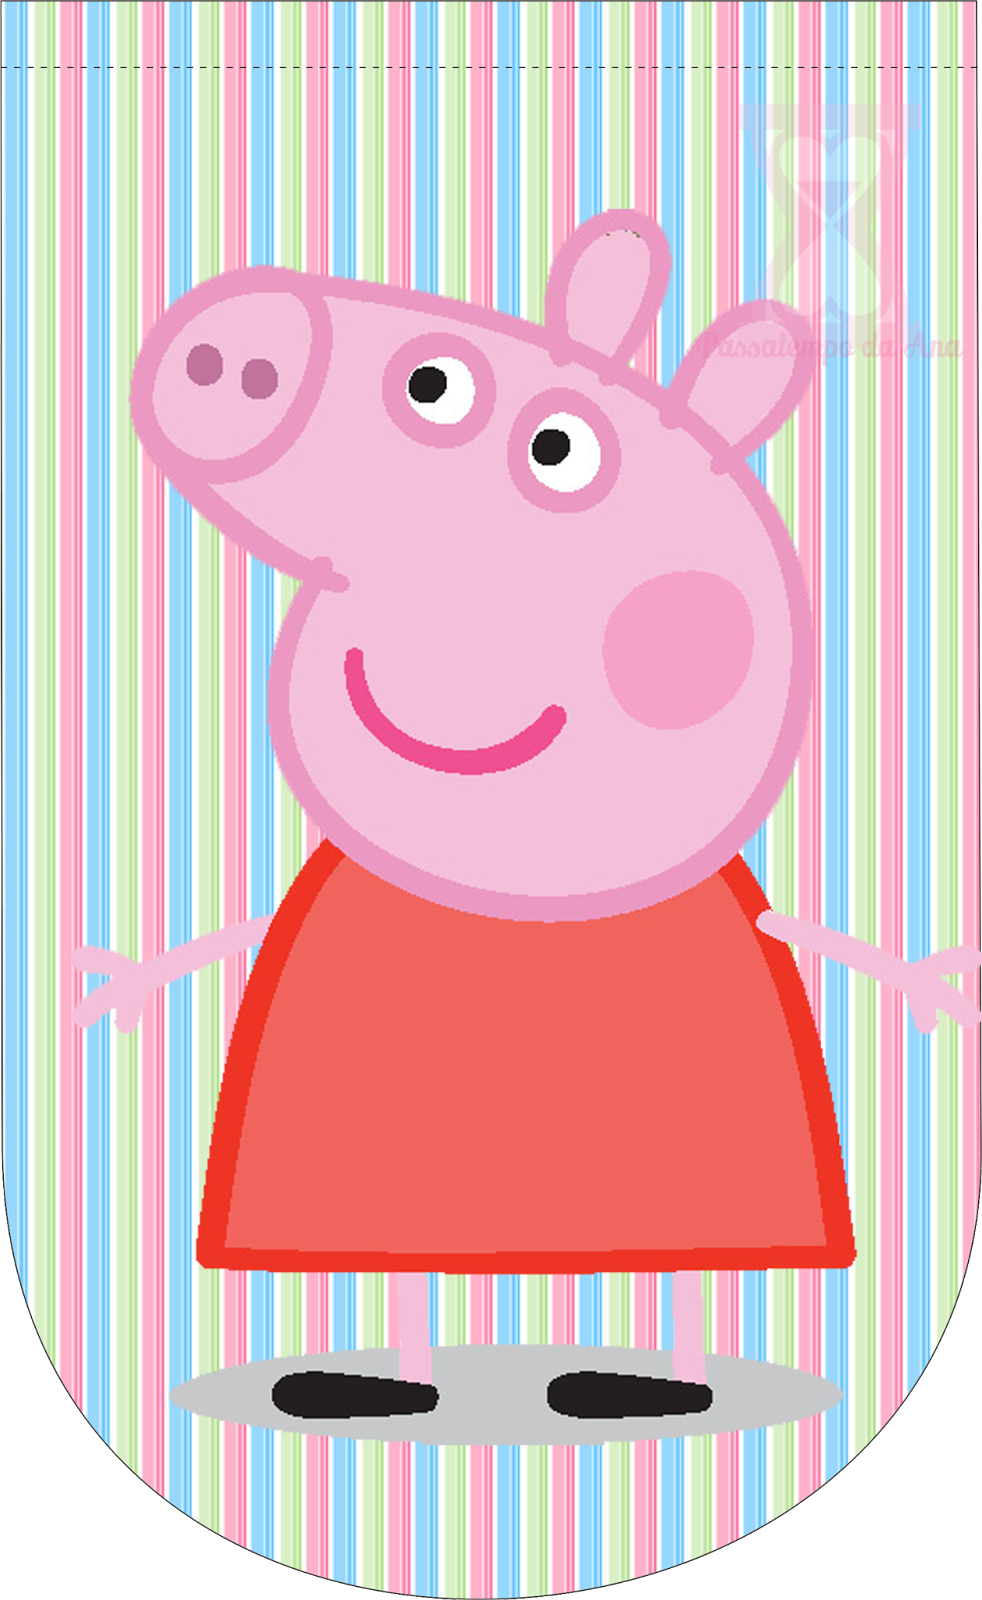 - Peppa Pig: Free Printable Invitations And Party Printables. (com